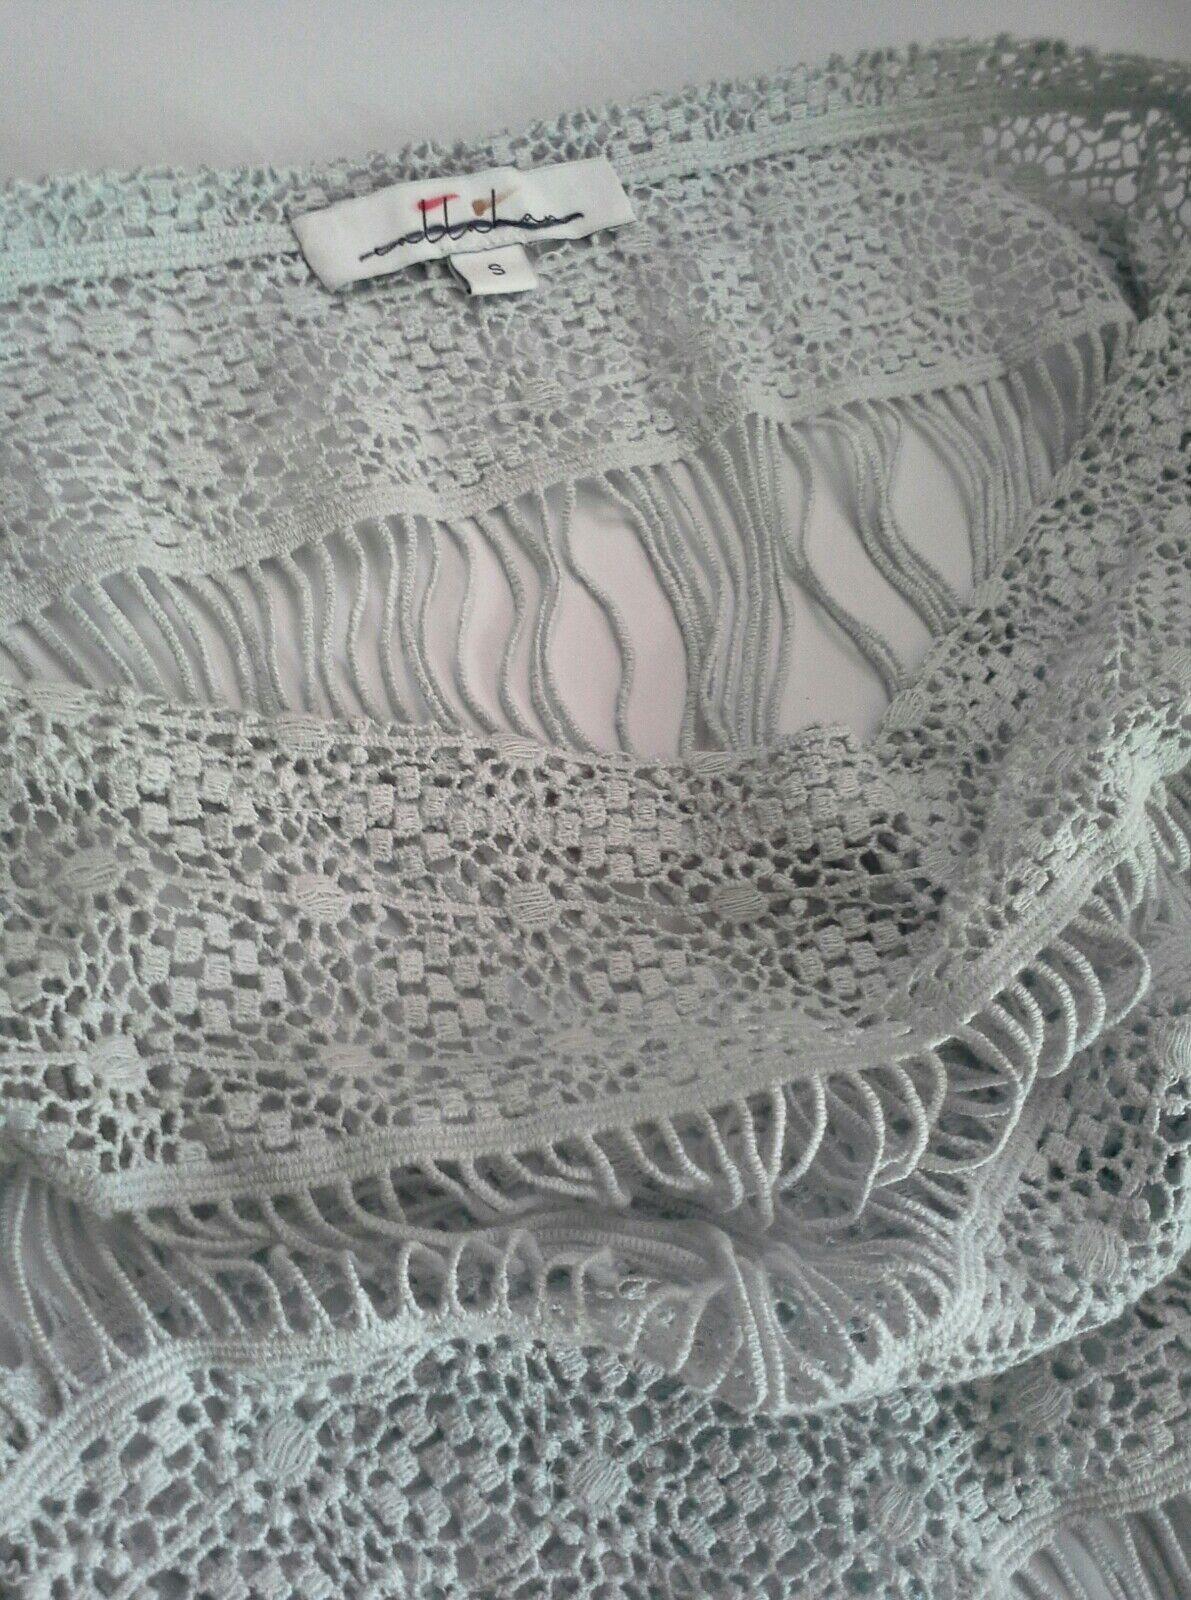 3b0c3843e58d ... Anthropologie Amelia Crocheted Crocheted Crocheted Maxi Dress by  Callahan Light Greyish bluee SMALL 46cdba ...